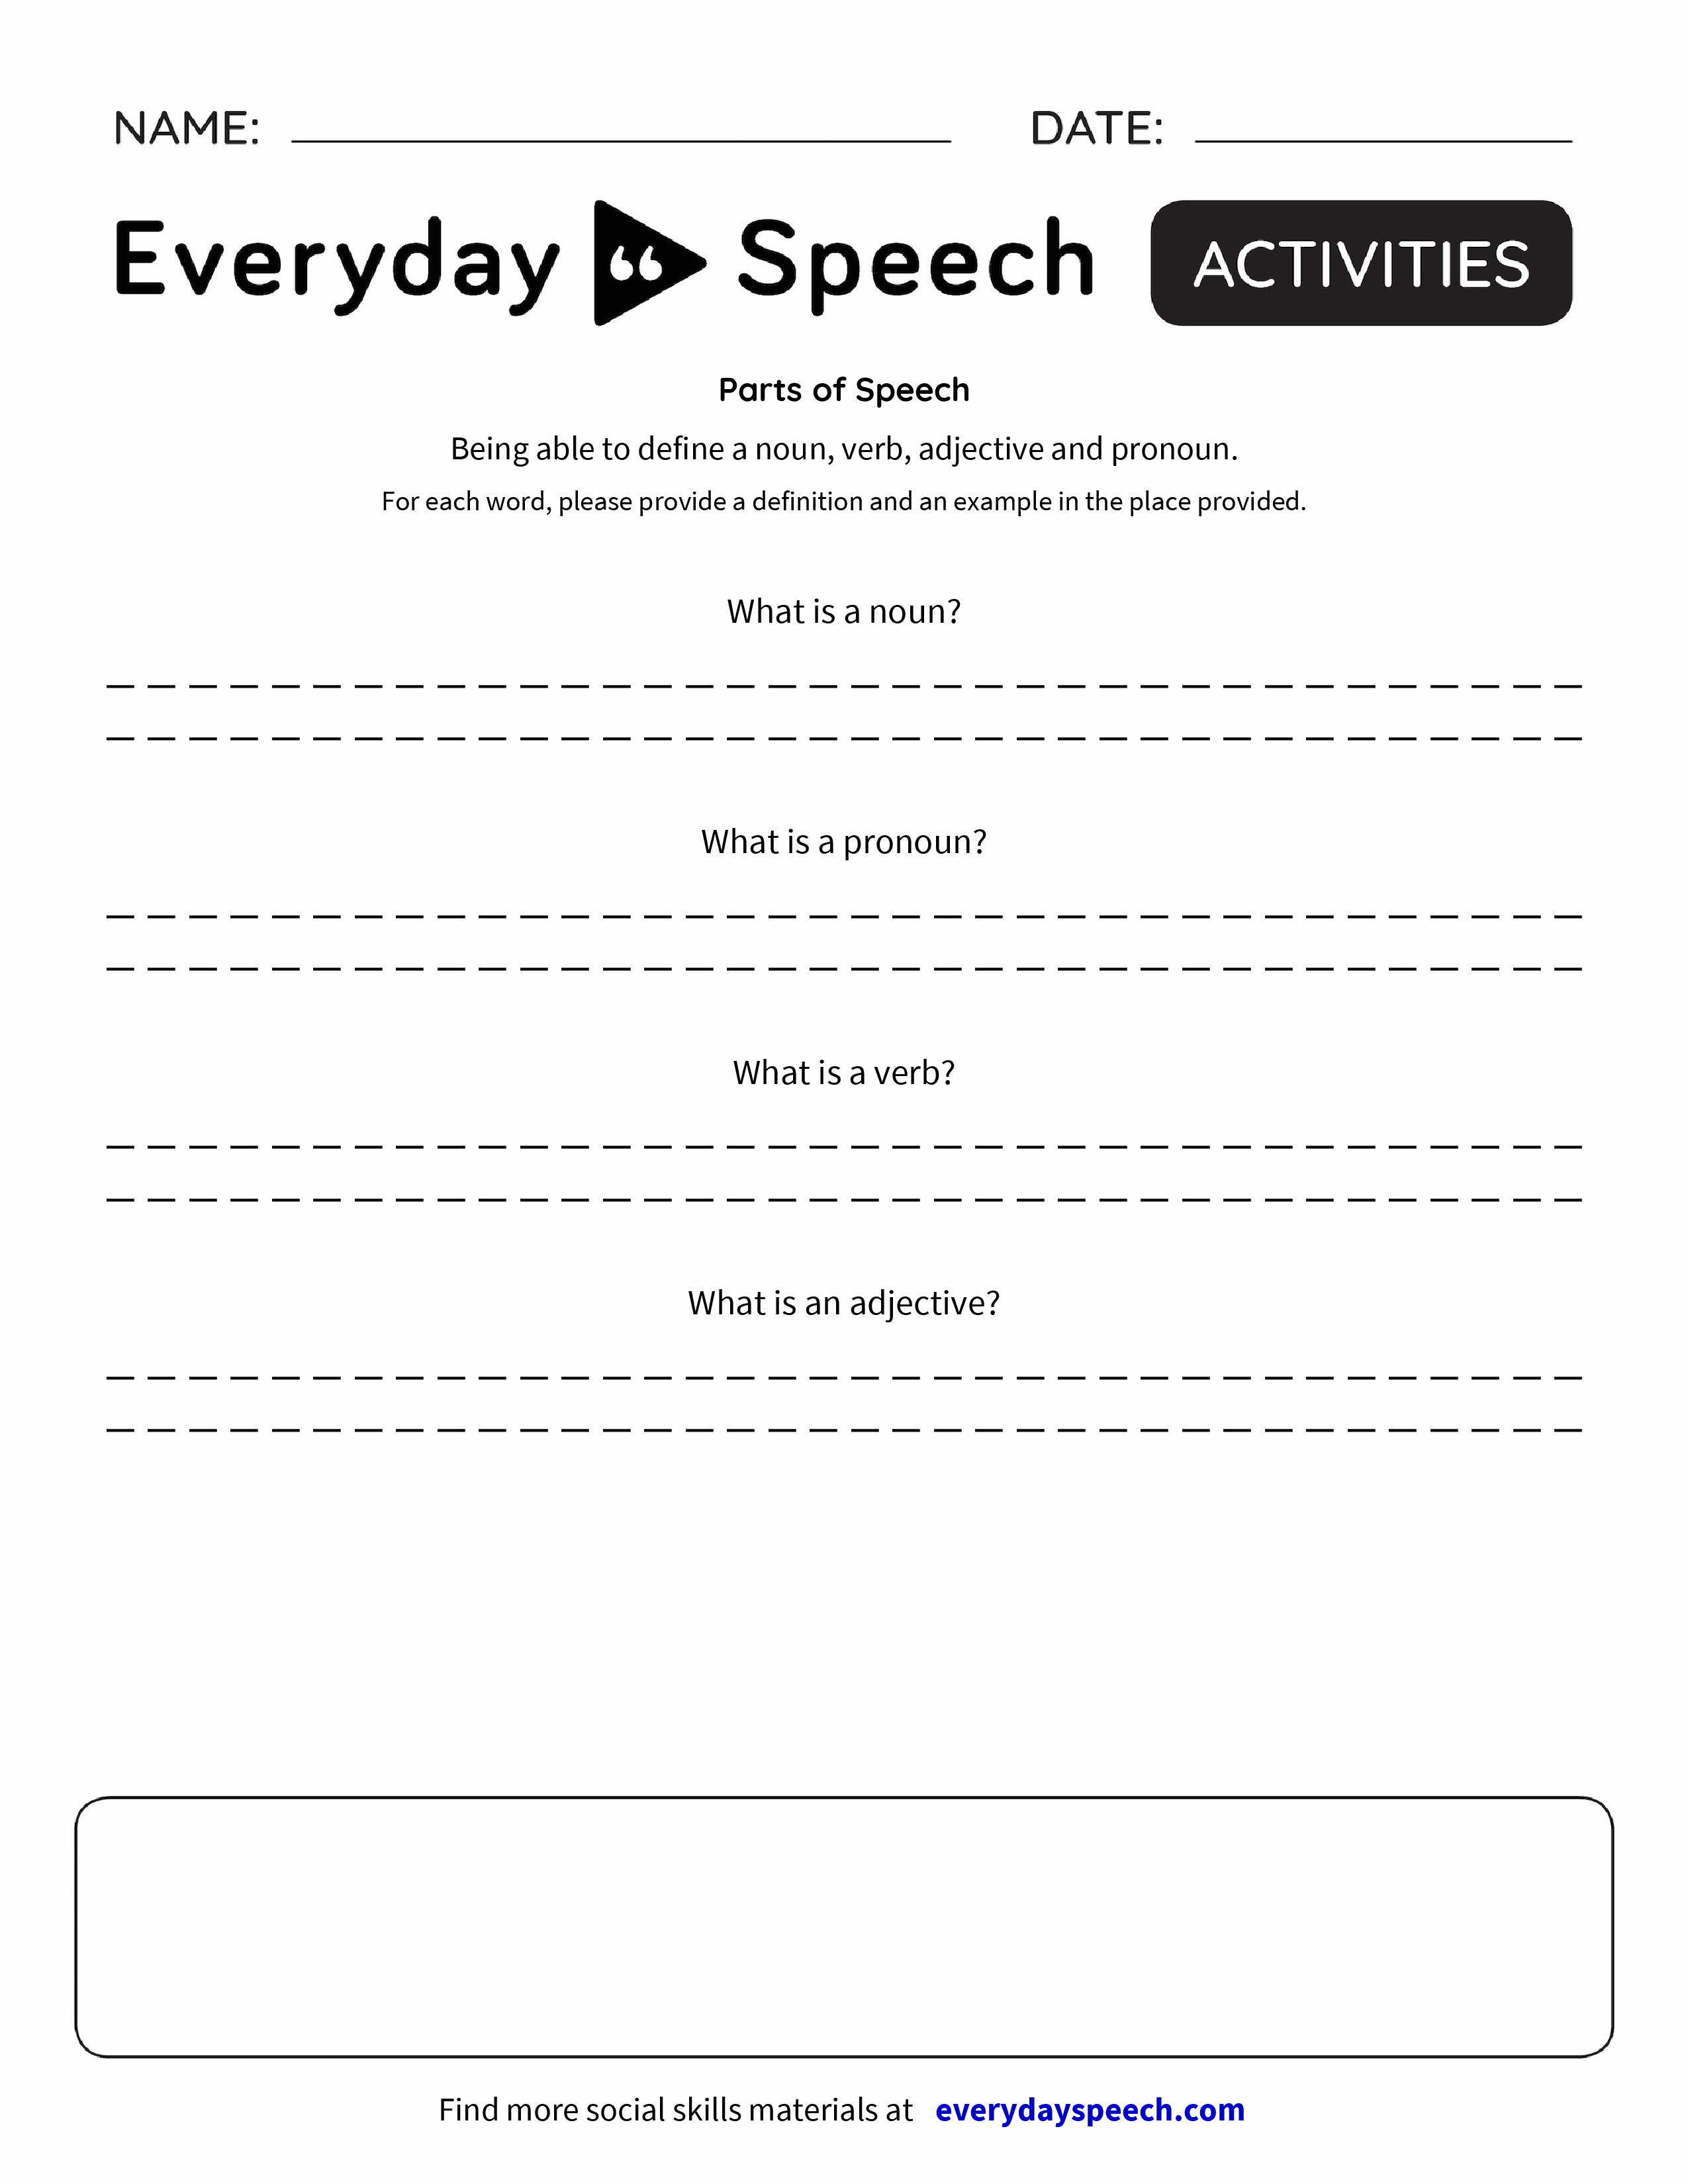 Free Worksheet Free Parts Of Speech Worksheets worksheets everyday speech speech